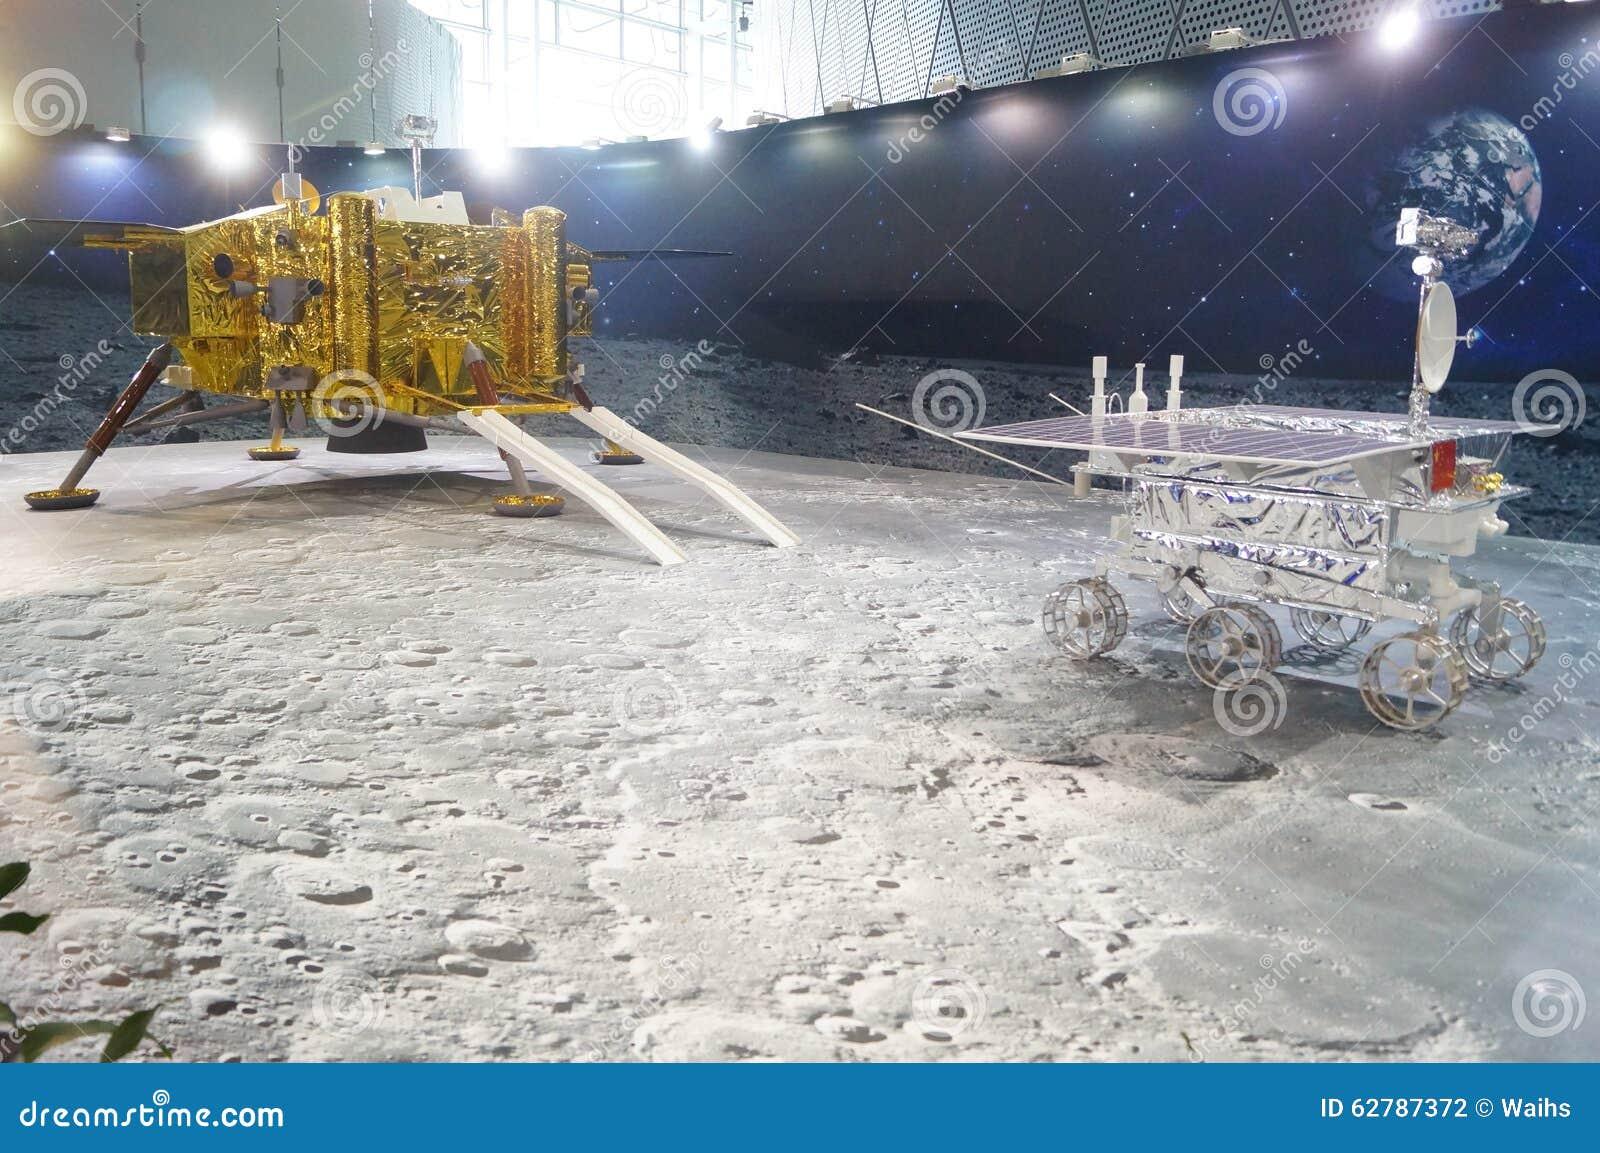 Shenzhen, Κίνα: Κινεζικές σεληνιακές δραστηριότητες εβδομάδας συνειδητοποίησης επιστήμης προγράμματος εξερεύνησης